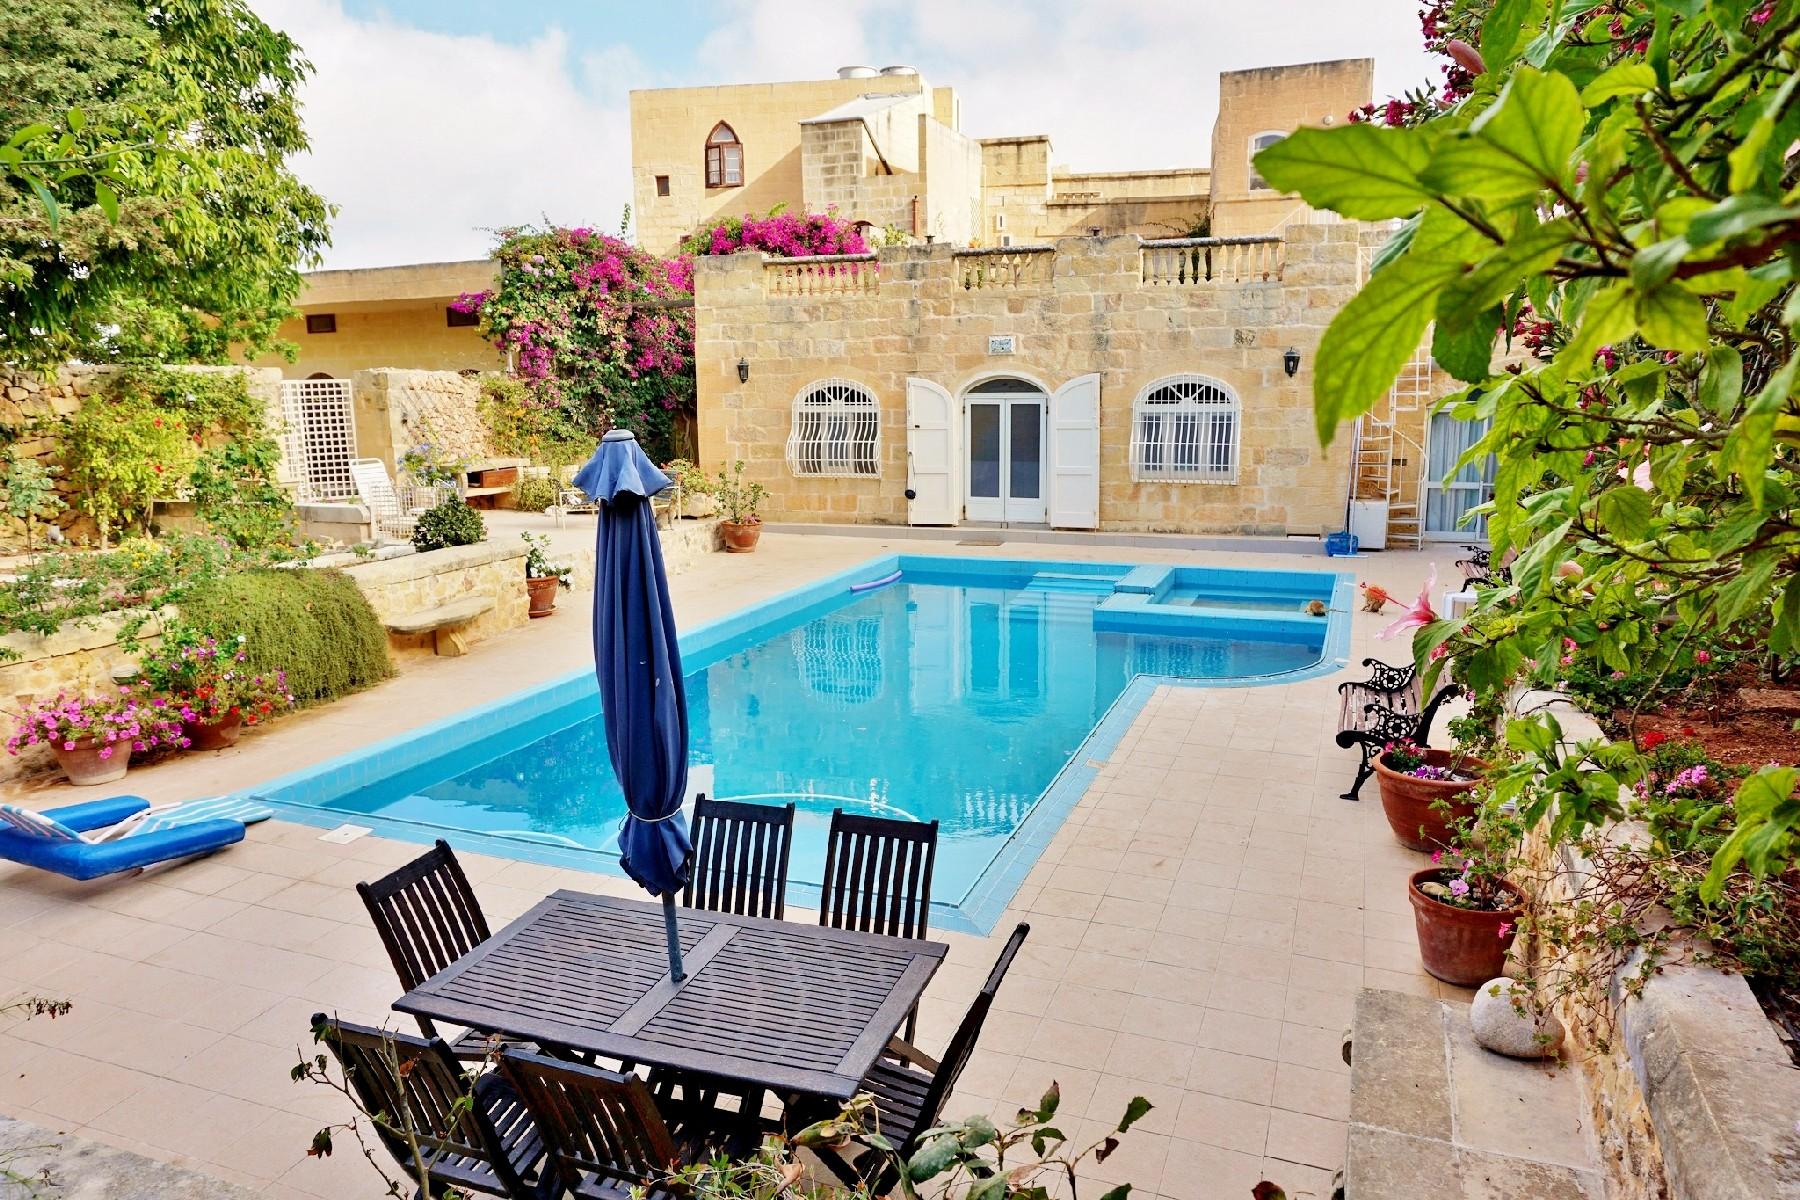 Malta Property for sale in Gozo-Island, Sannat